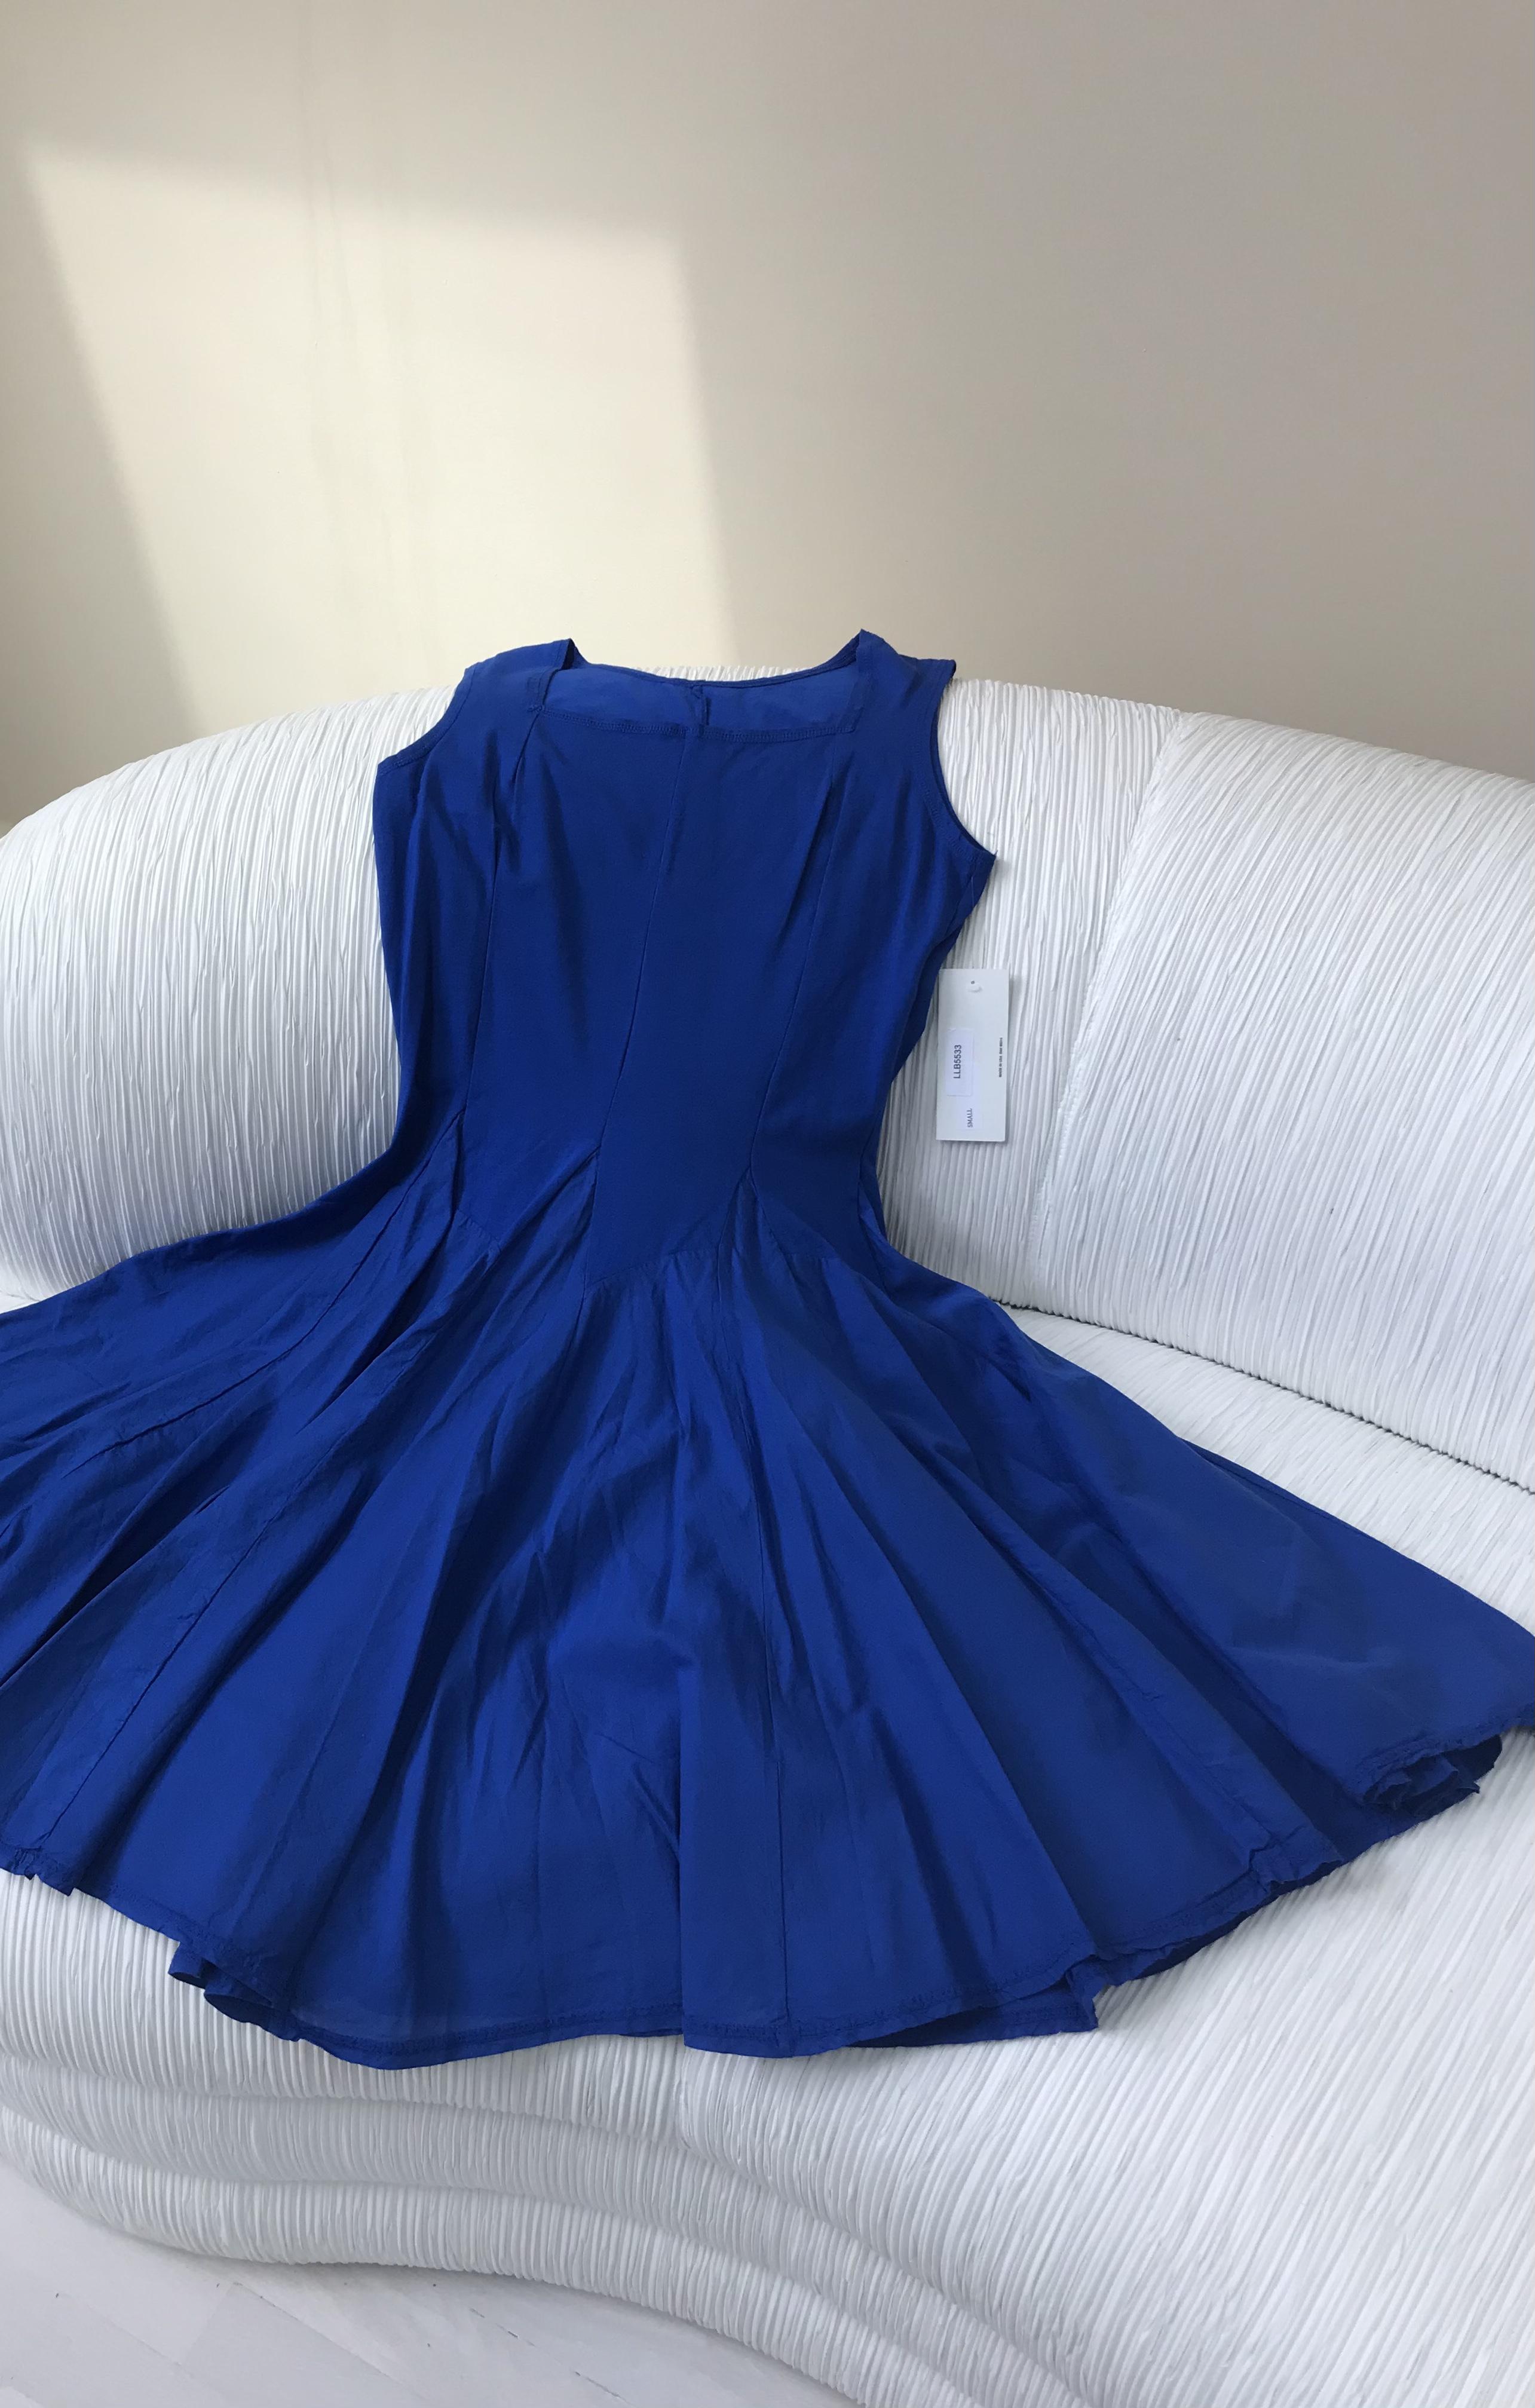 Luna Luz: Godet Dyed Square Neck Dress (Ships Immed in Electric Blue, 1 Left!) LL_5533_ELECTRIC_BLUE